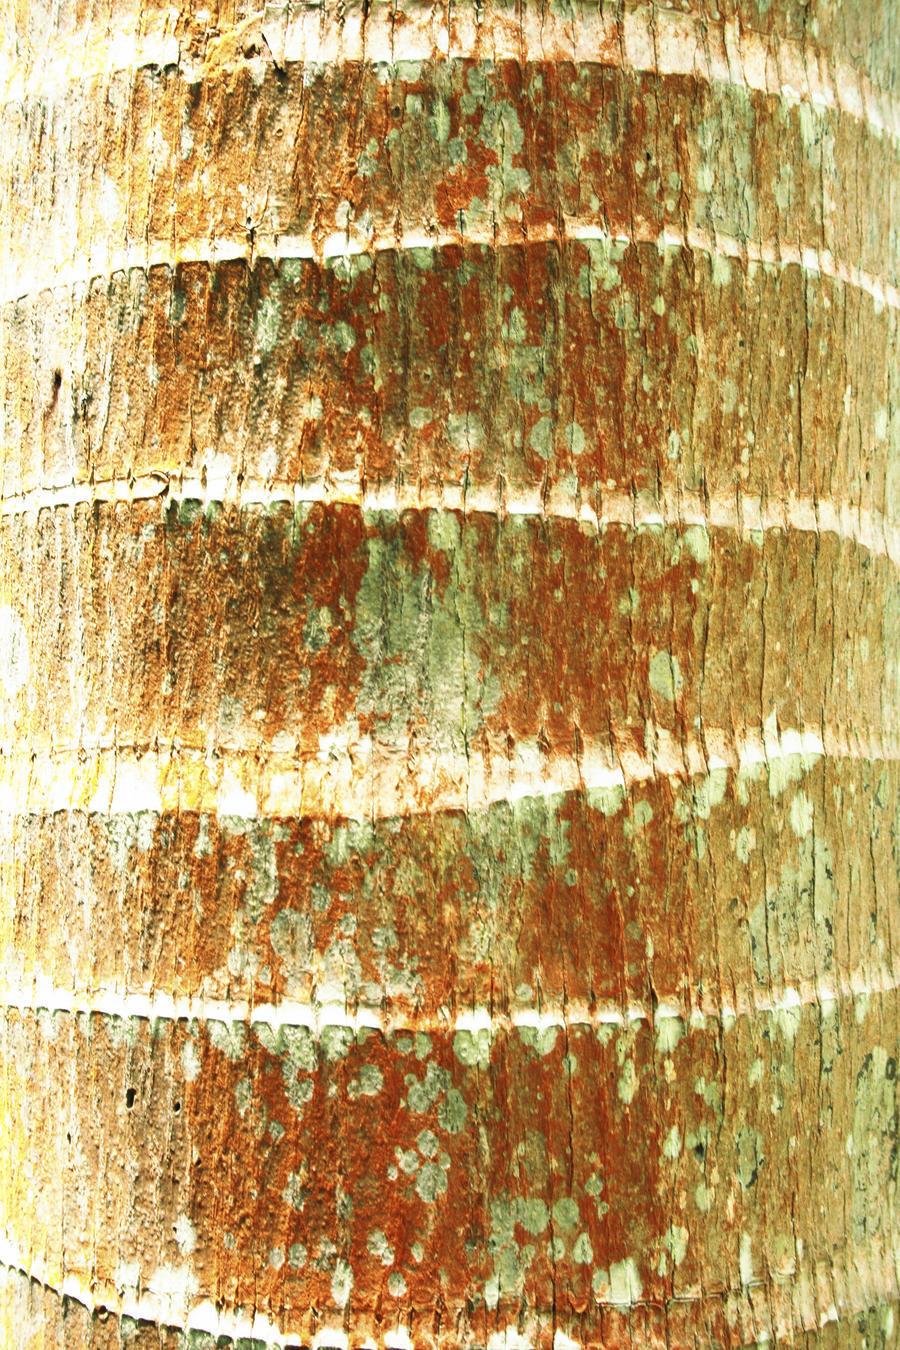 Hawaii, Oahu, Close-Up Of Coconut Palm Tree Bark Texture.  Print